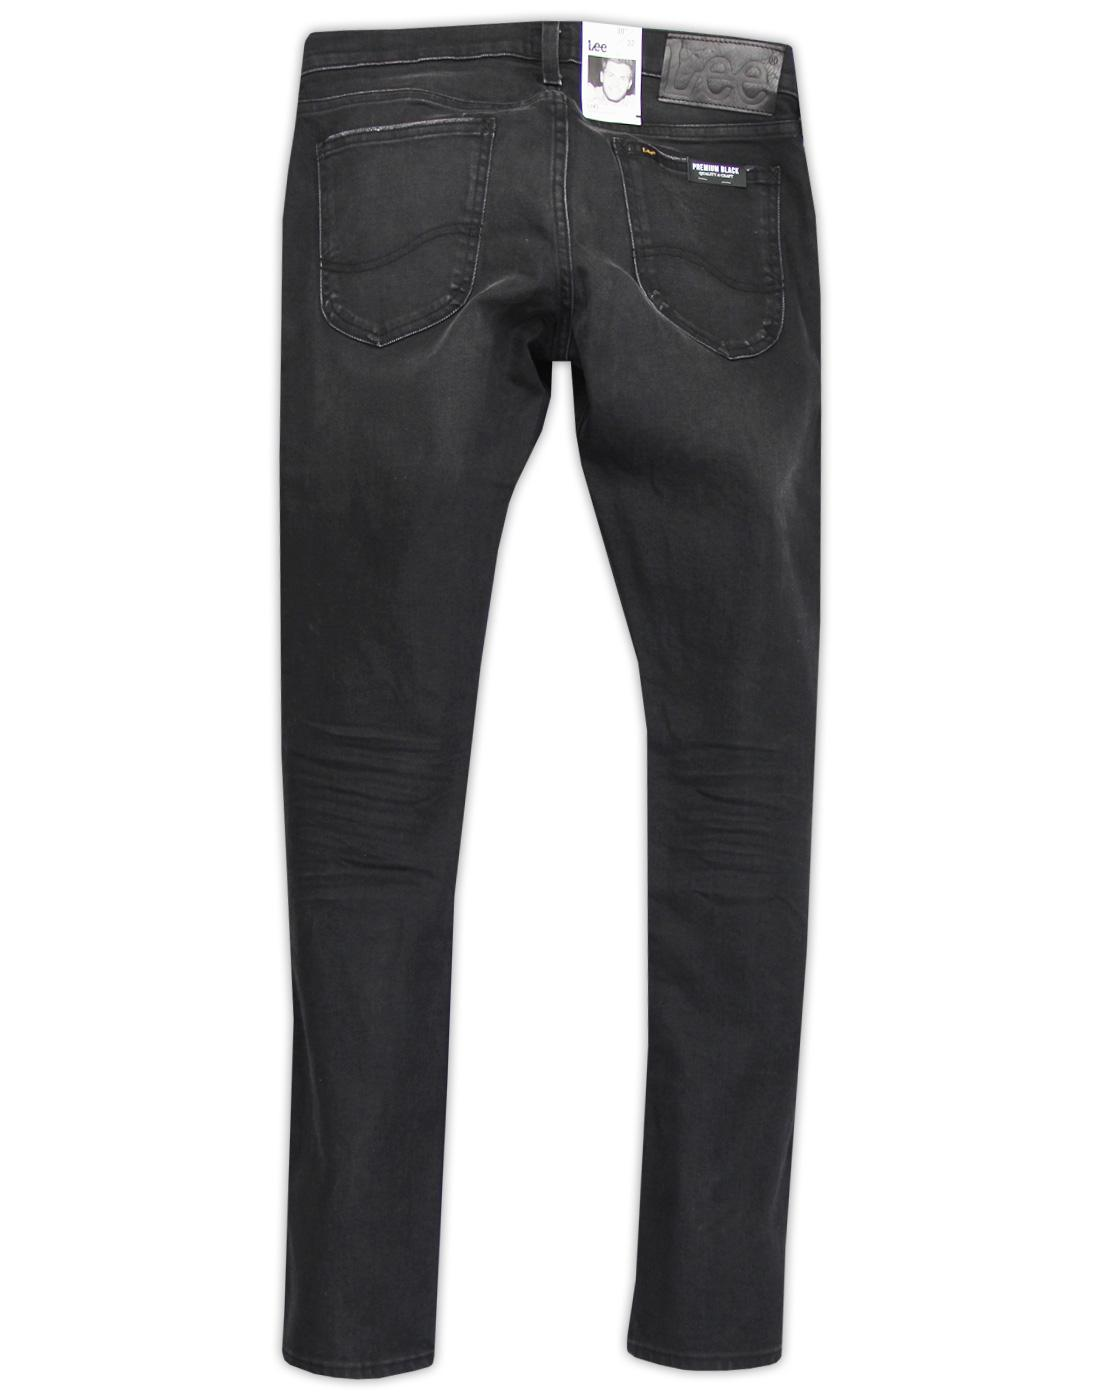 c90e5008 LEE Luke Men's Retro Indie Slim Tapered Denim Jeans in Black Worn